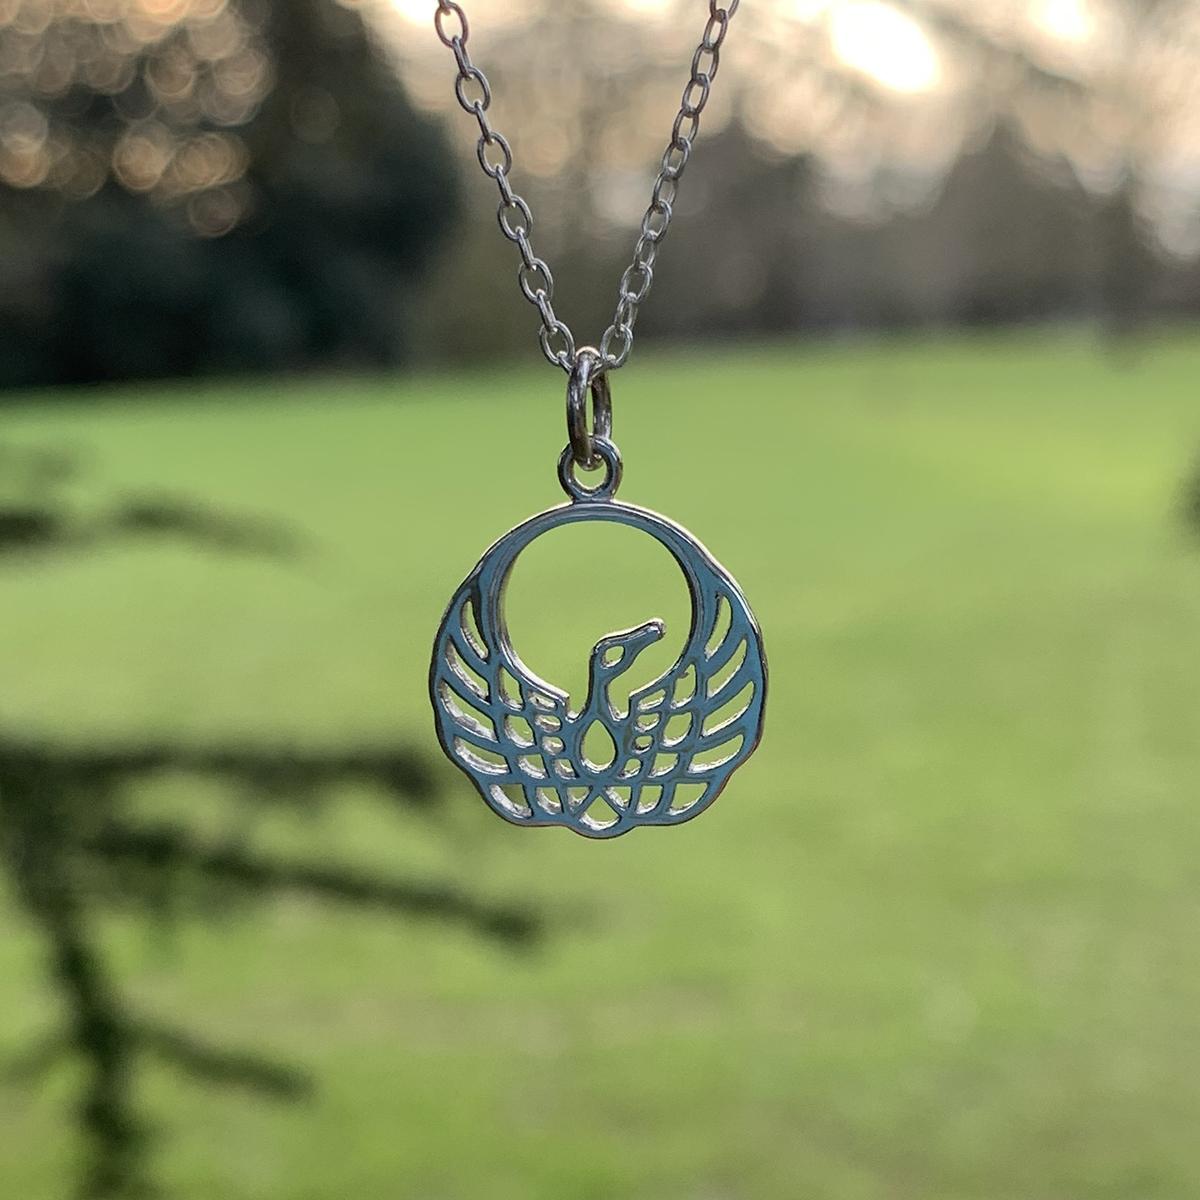 Phoenix Necklace Photoshoot